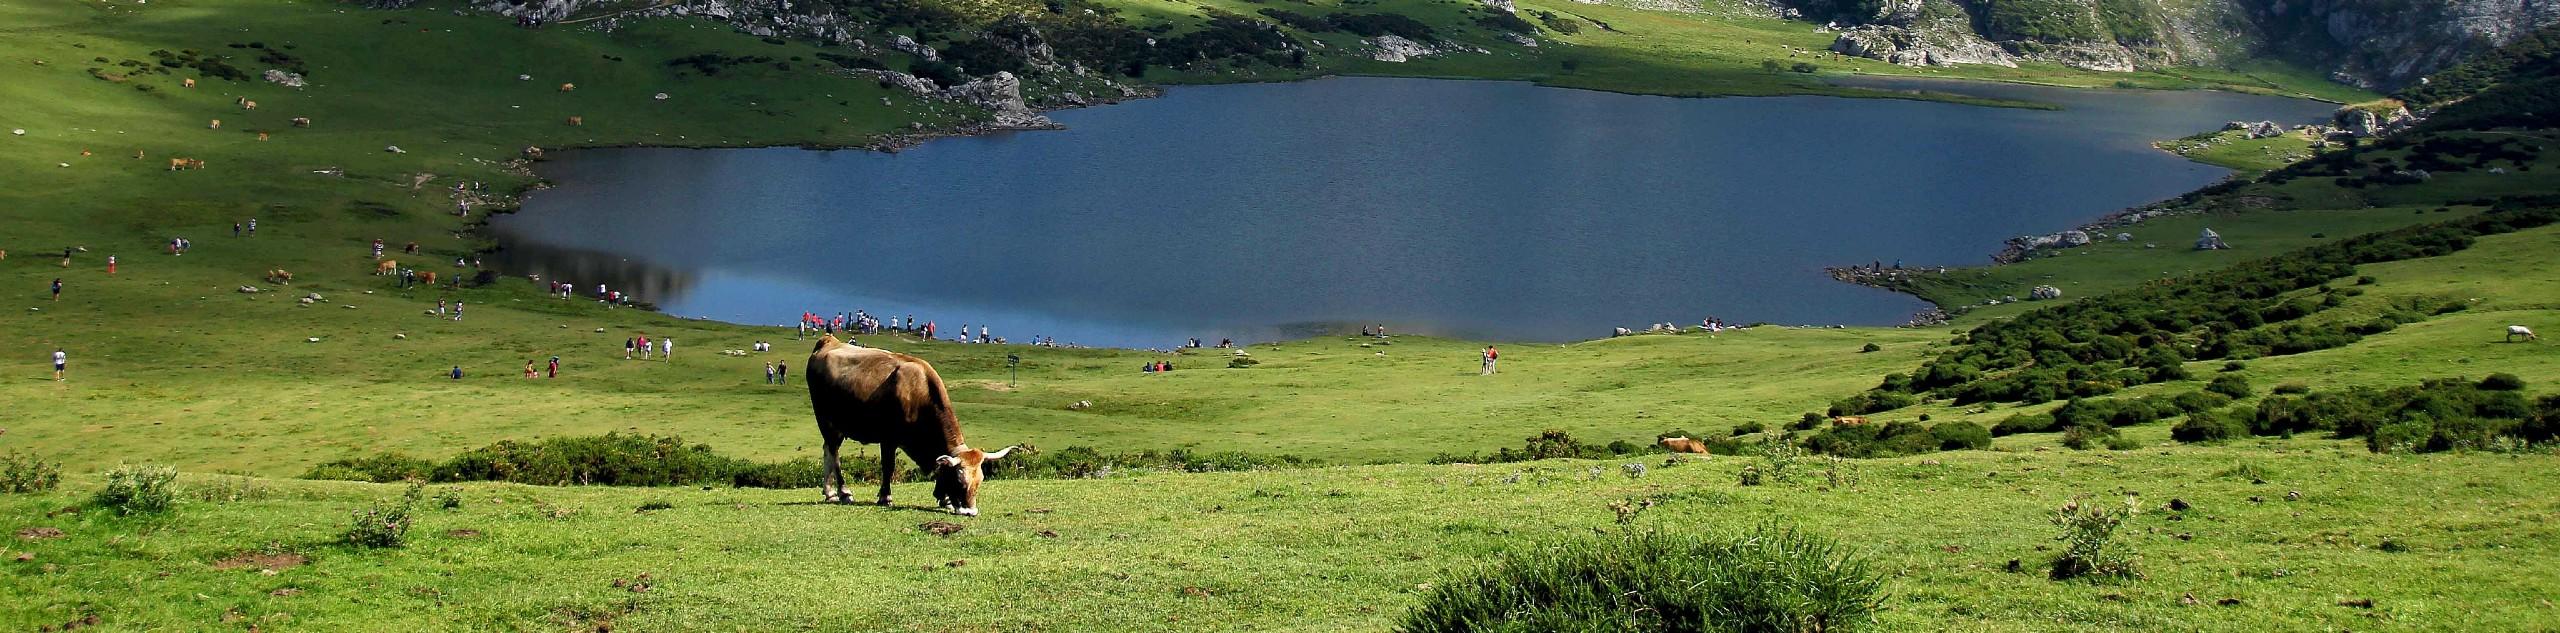 Cow near the lake in Asturias